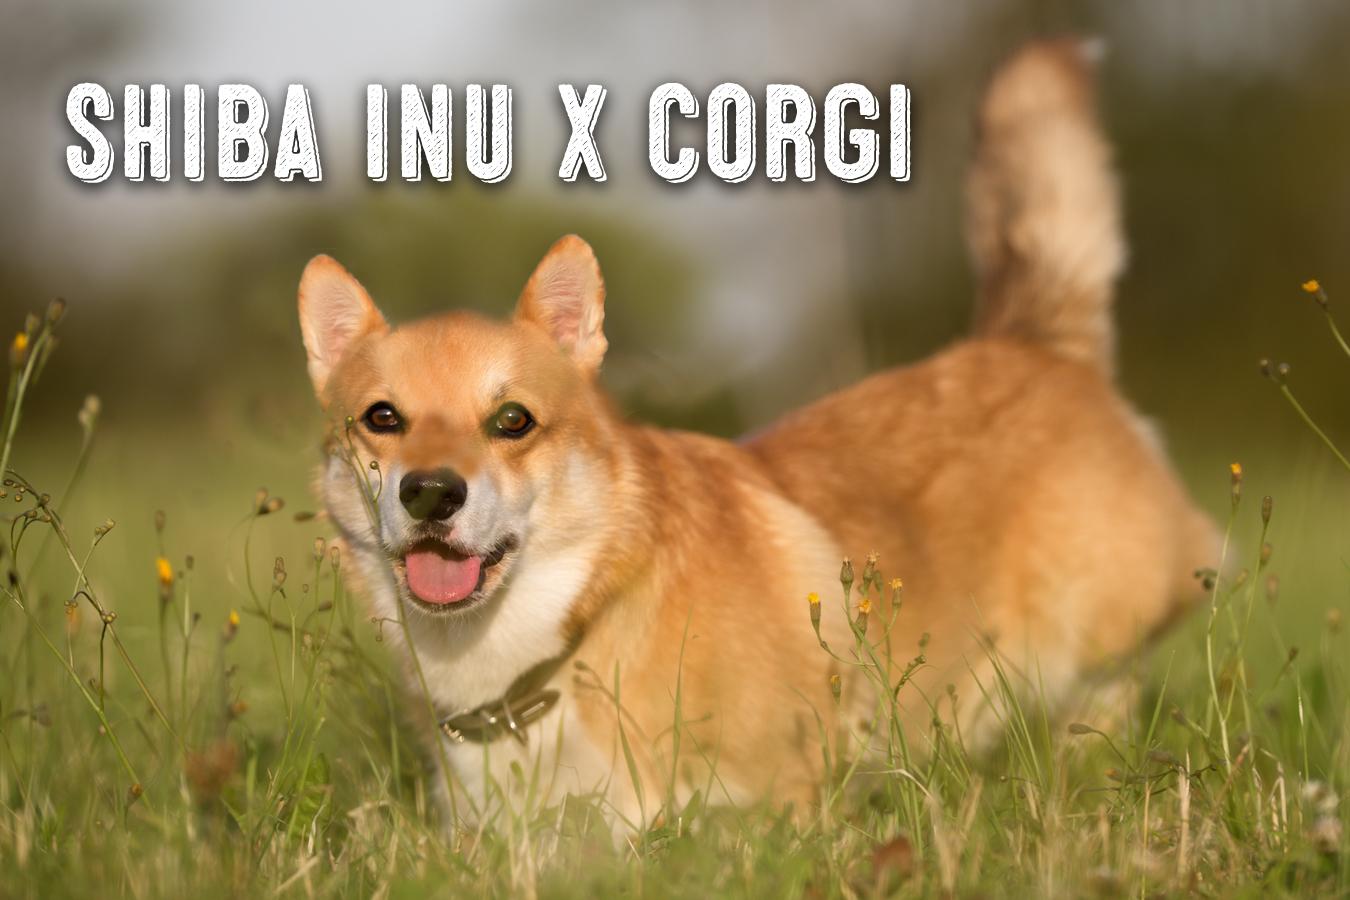 The Shiba Inu Corgi Mix My First Shiba Inu